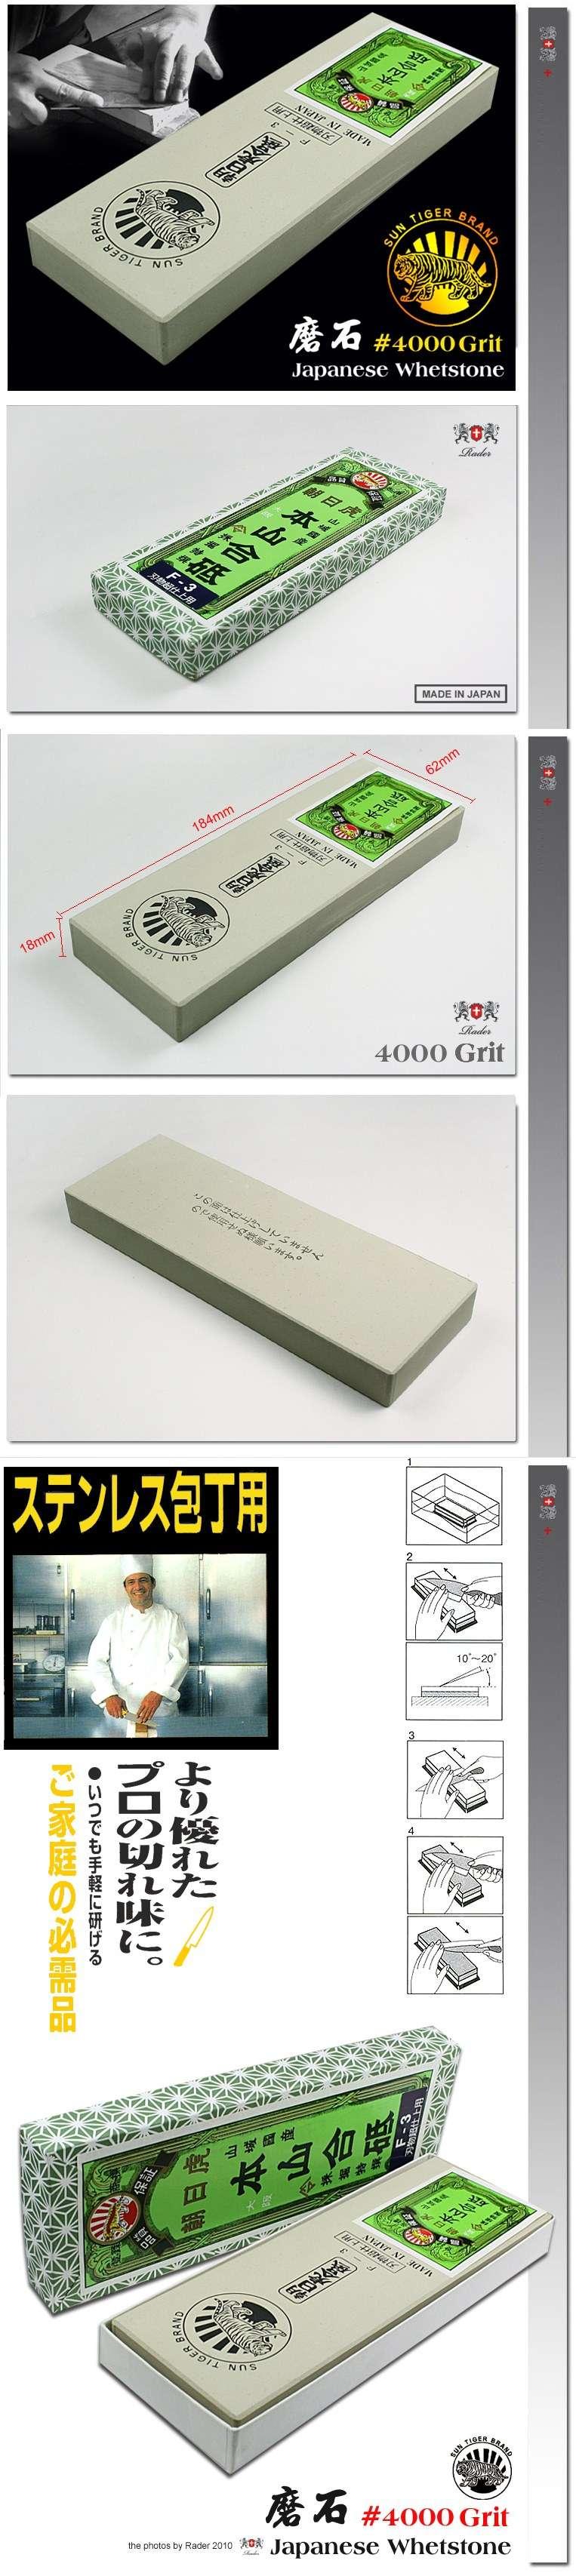 Japanese SunTiger Whetstone /& Holder #2000 Grit Waterstone Flatware Tools